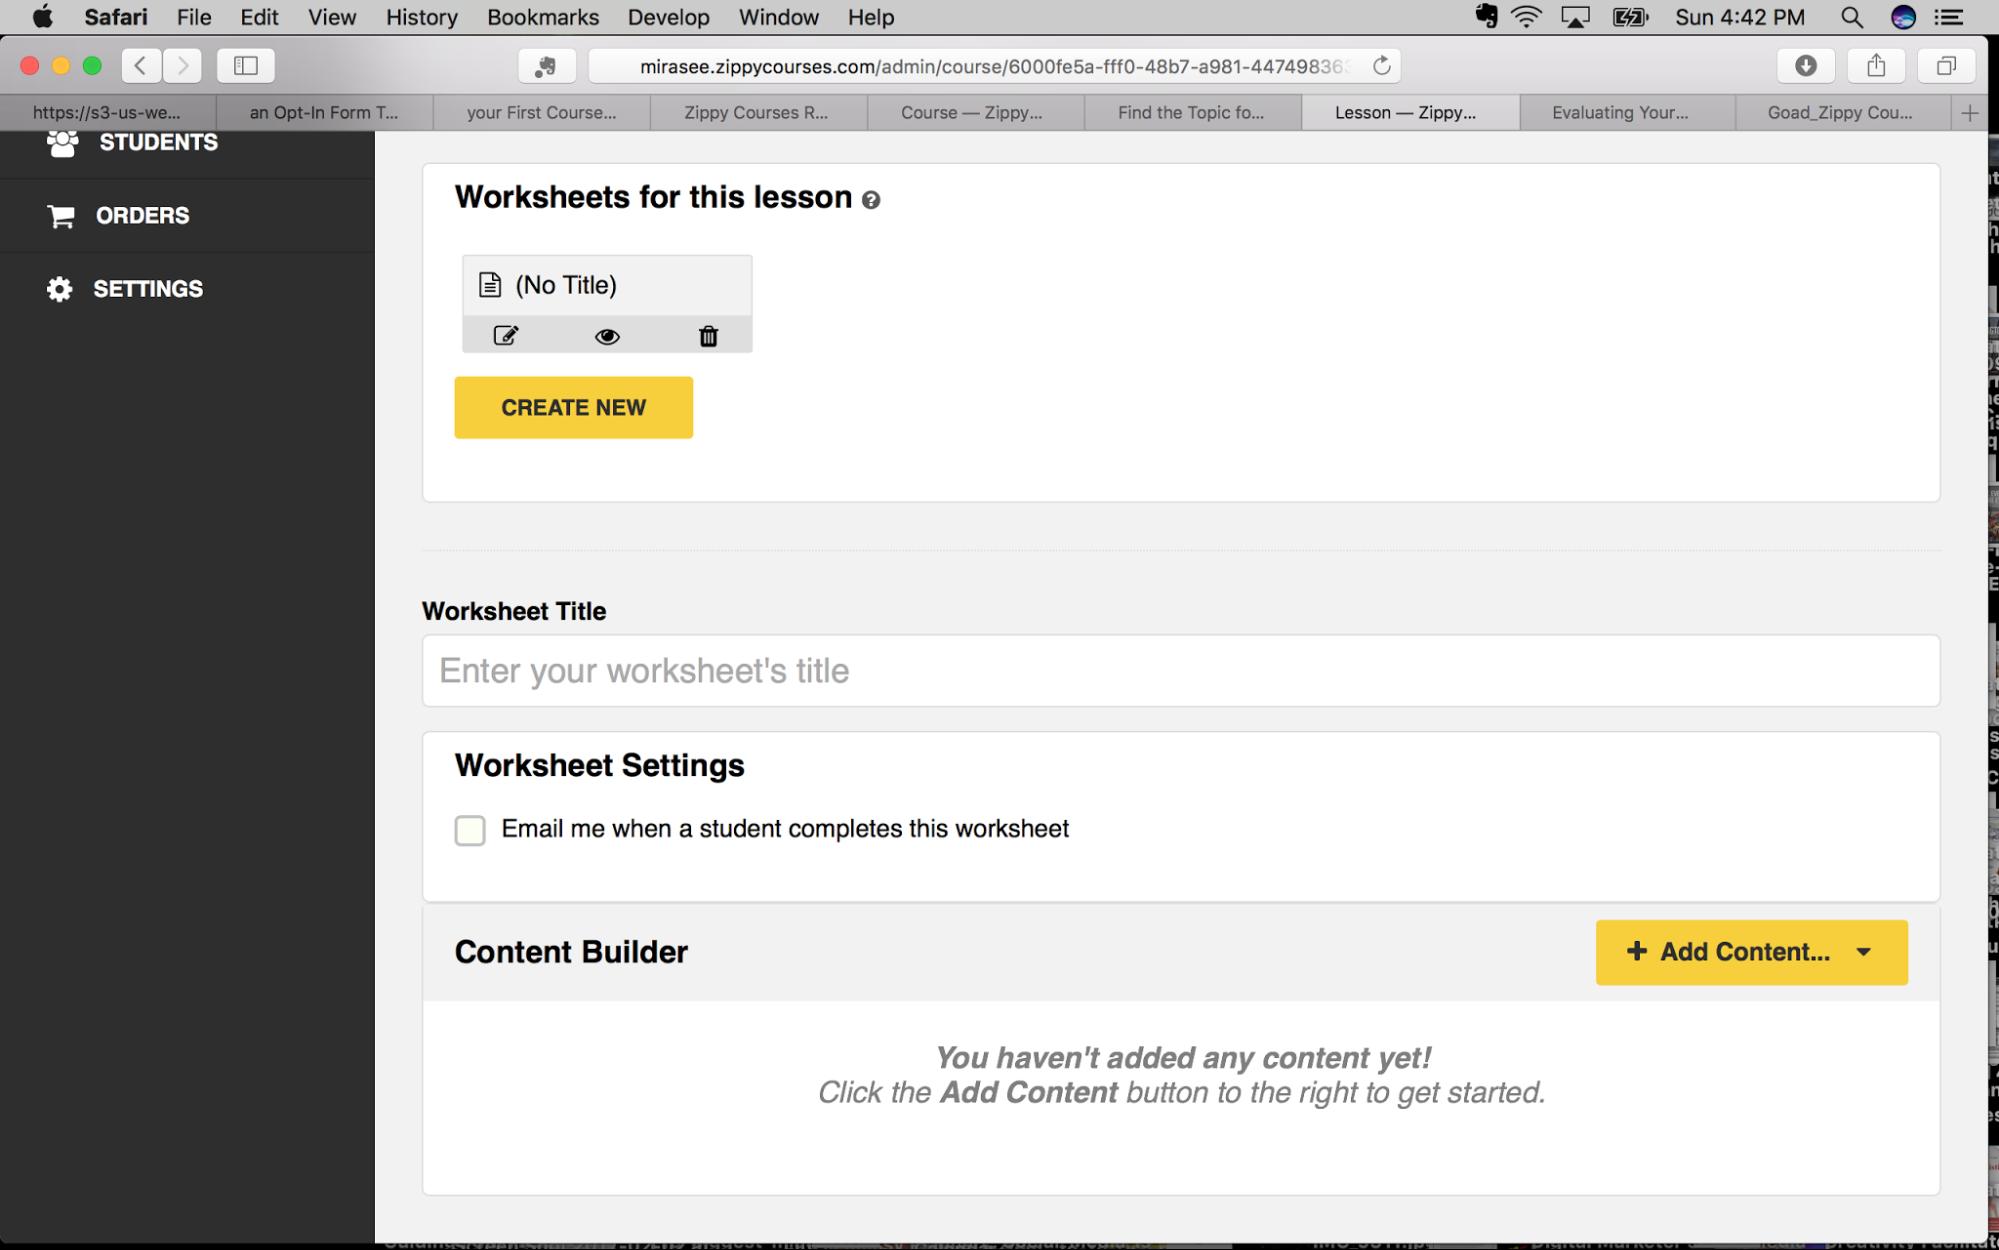 Zippy Courses Worksheet function